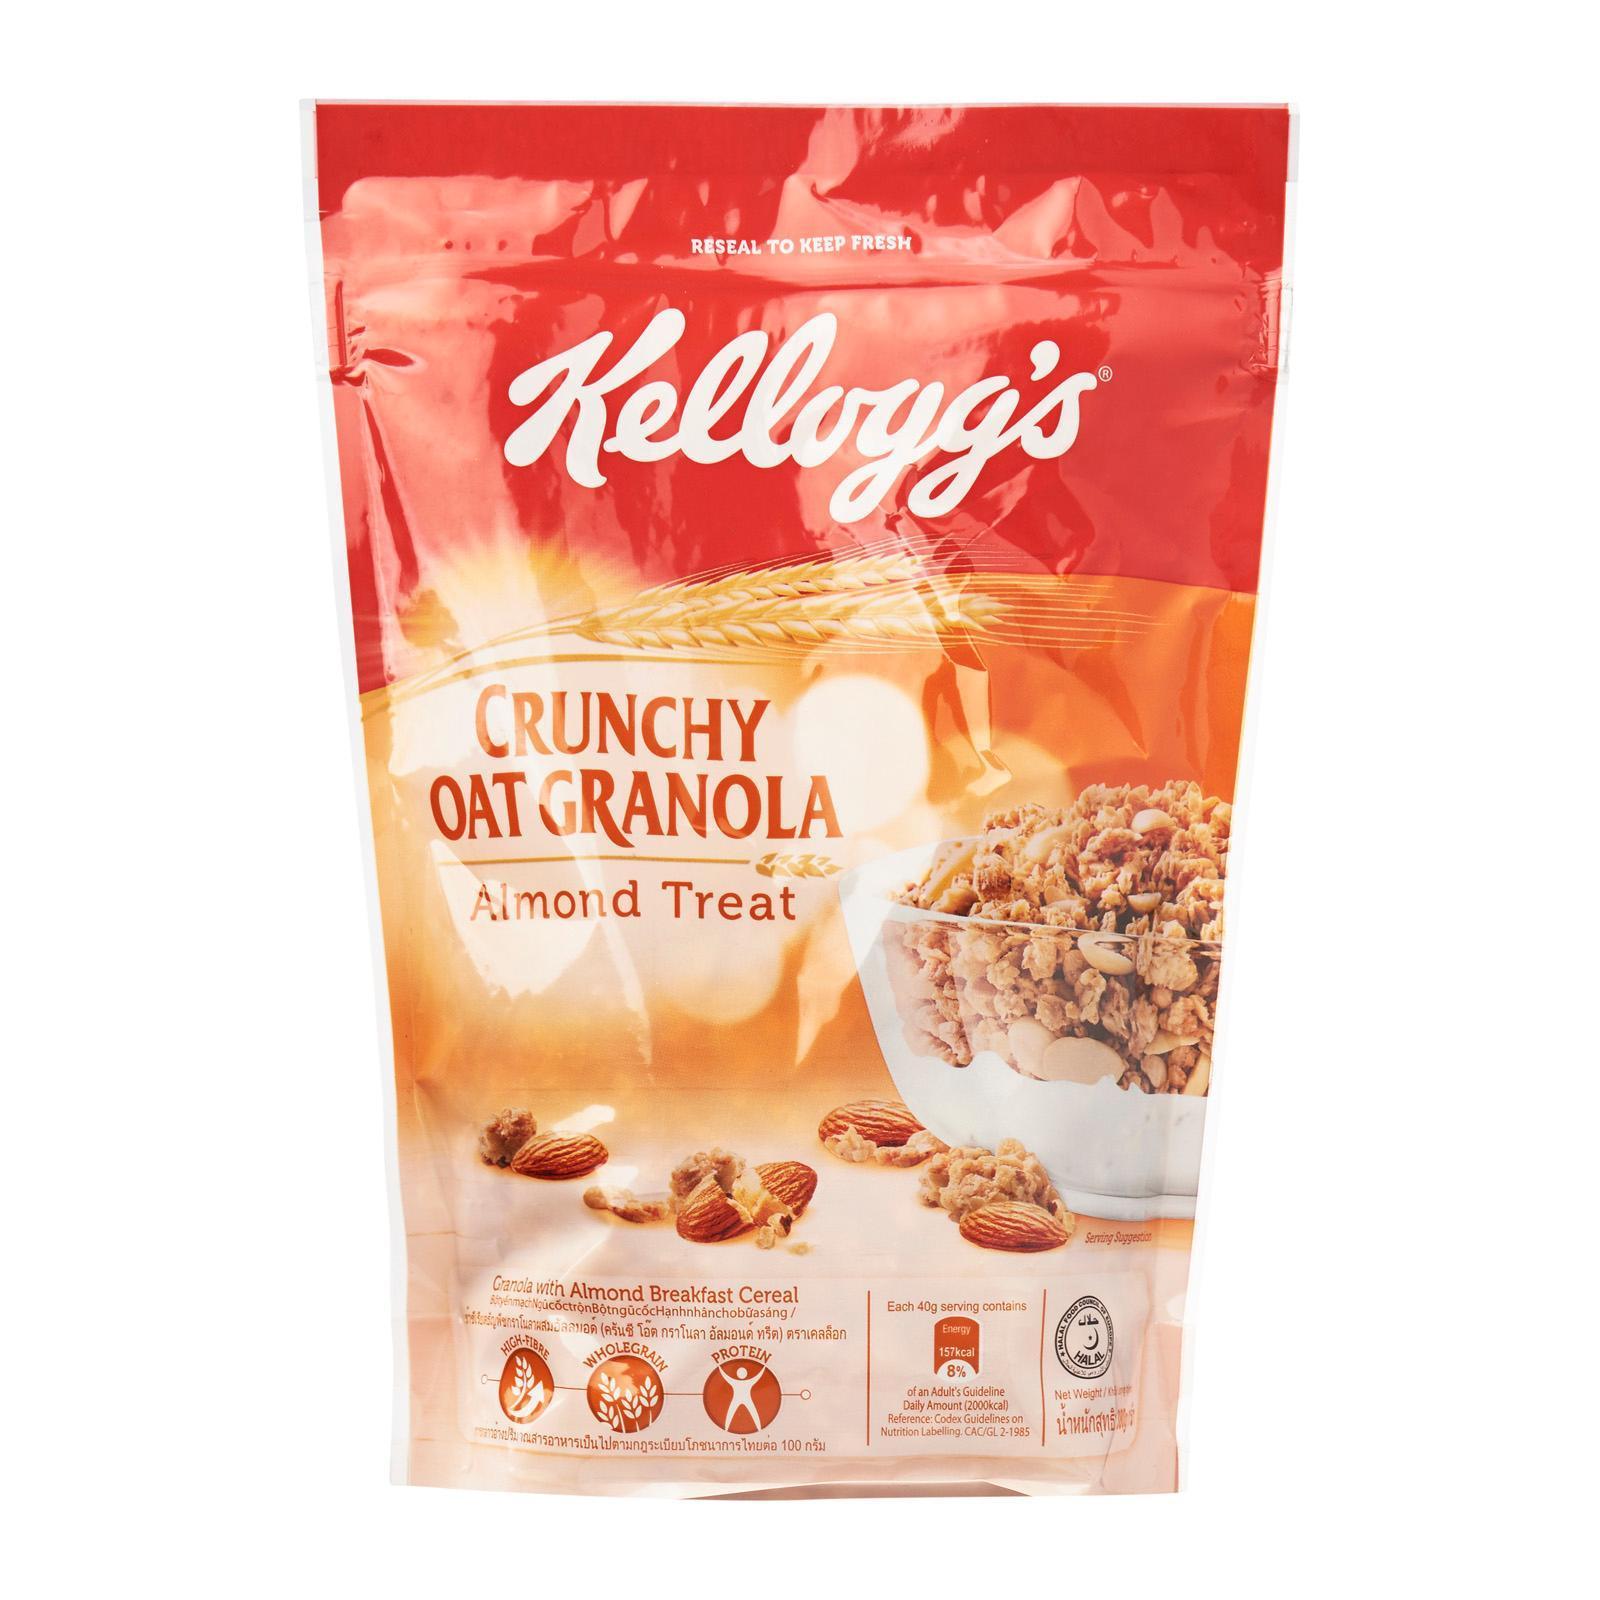 KELLOGG'S Crunchy Oat Granola - Almond Treat 380g